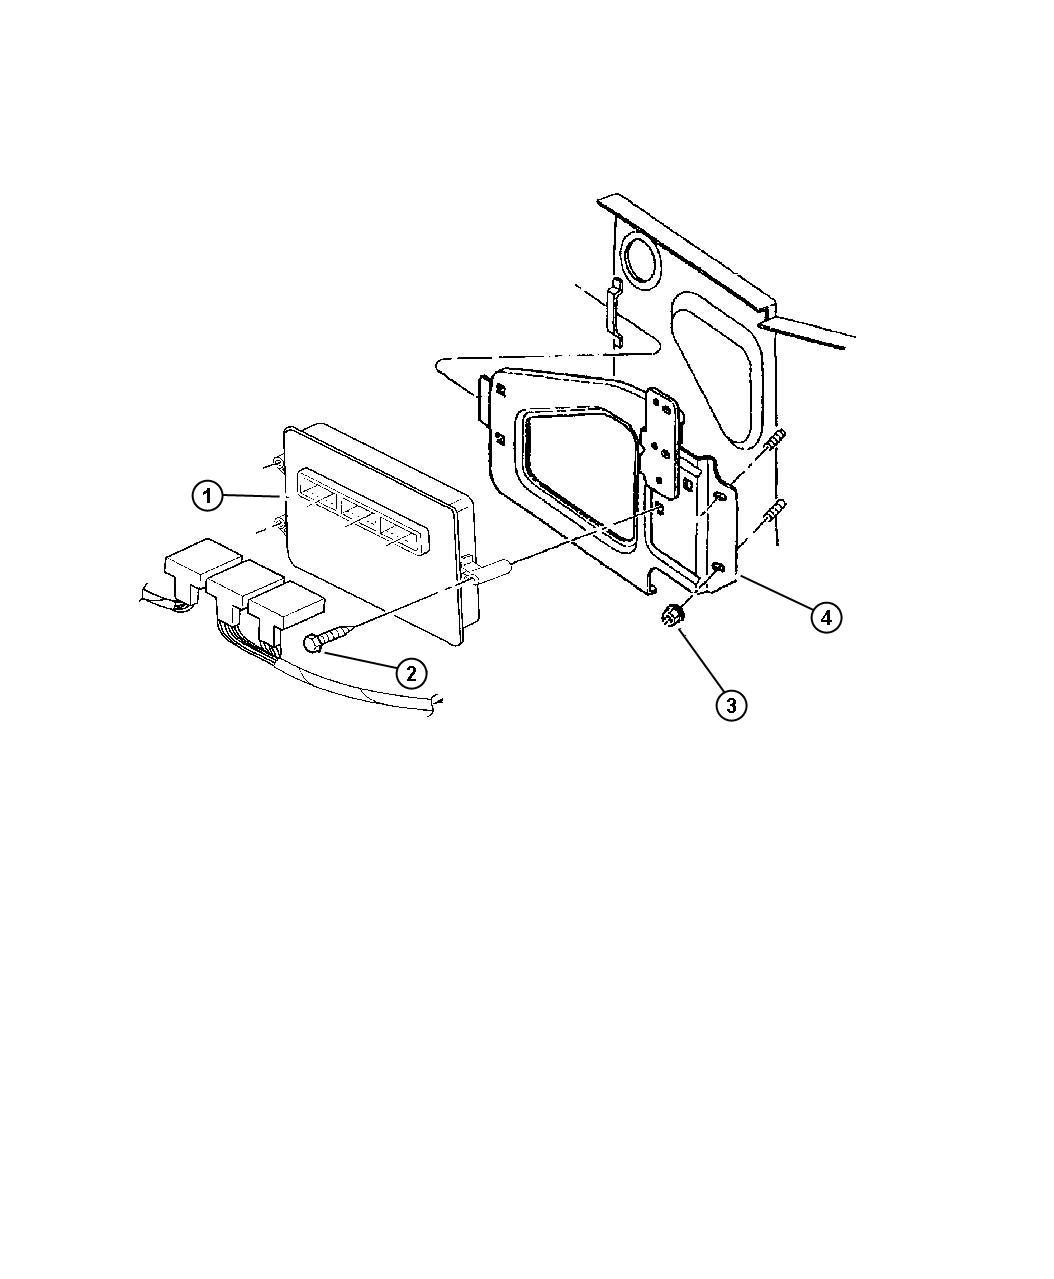 Ram Bracket Module Standard Jtec Module Pjtec